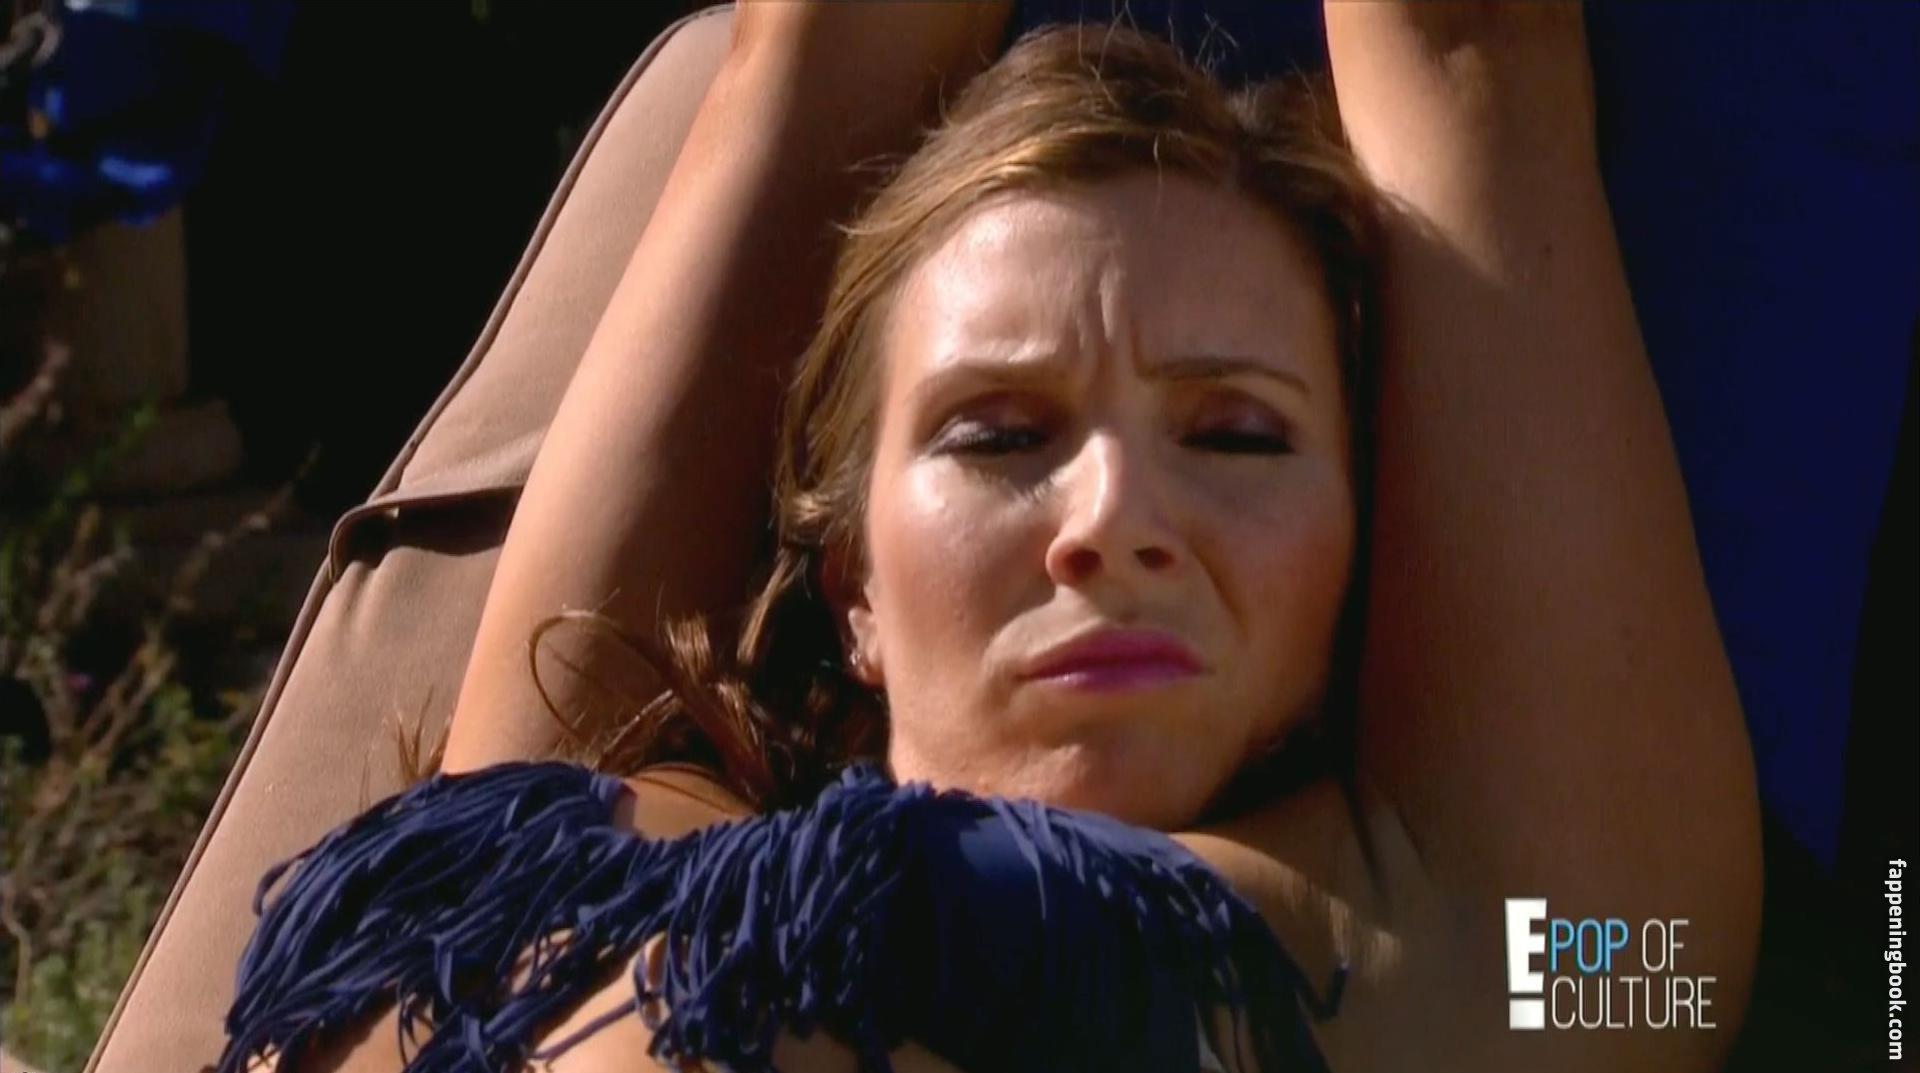 June diane raphael nude